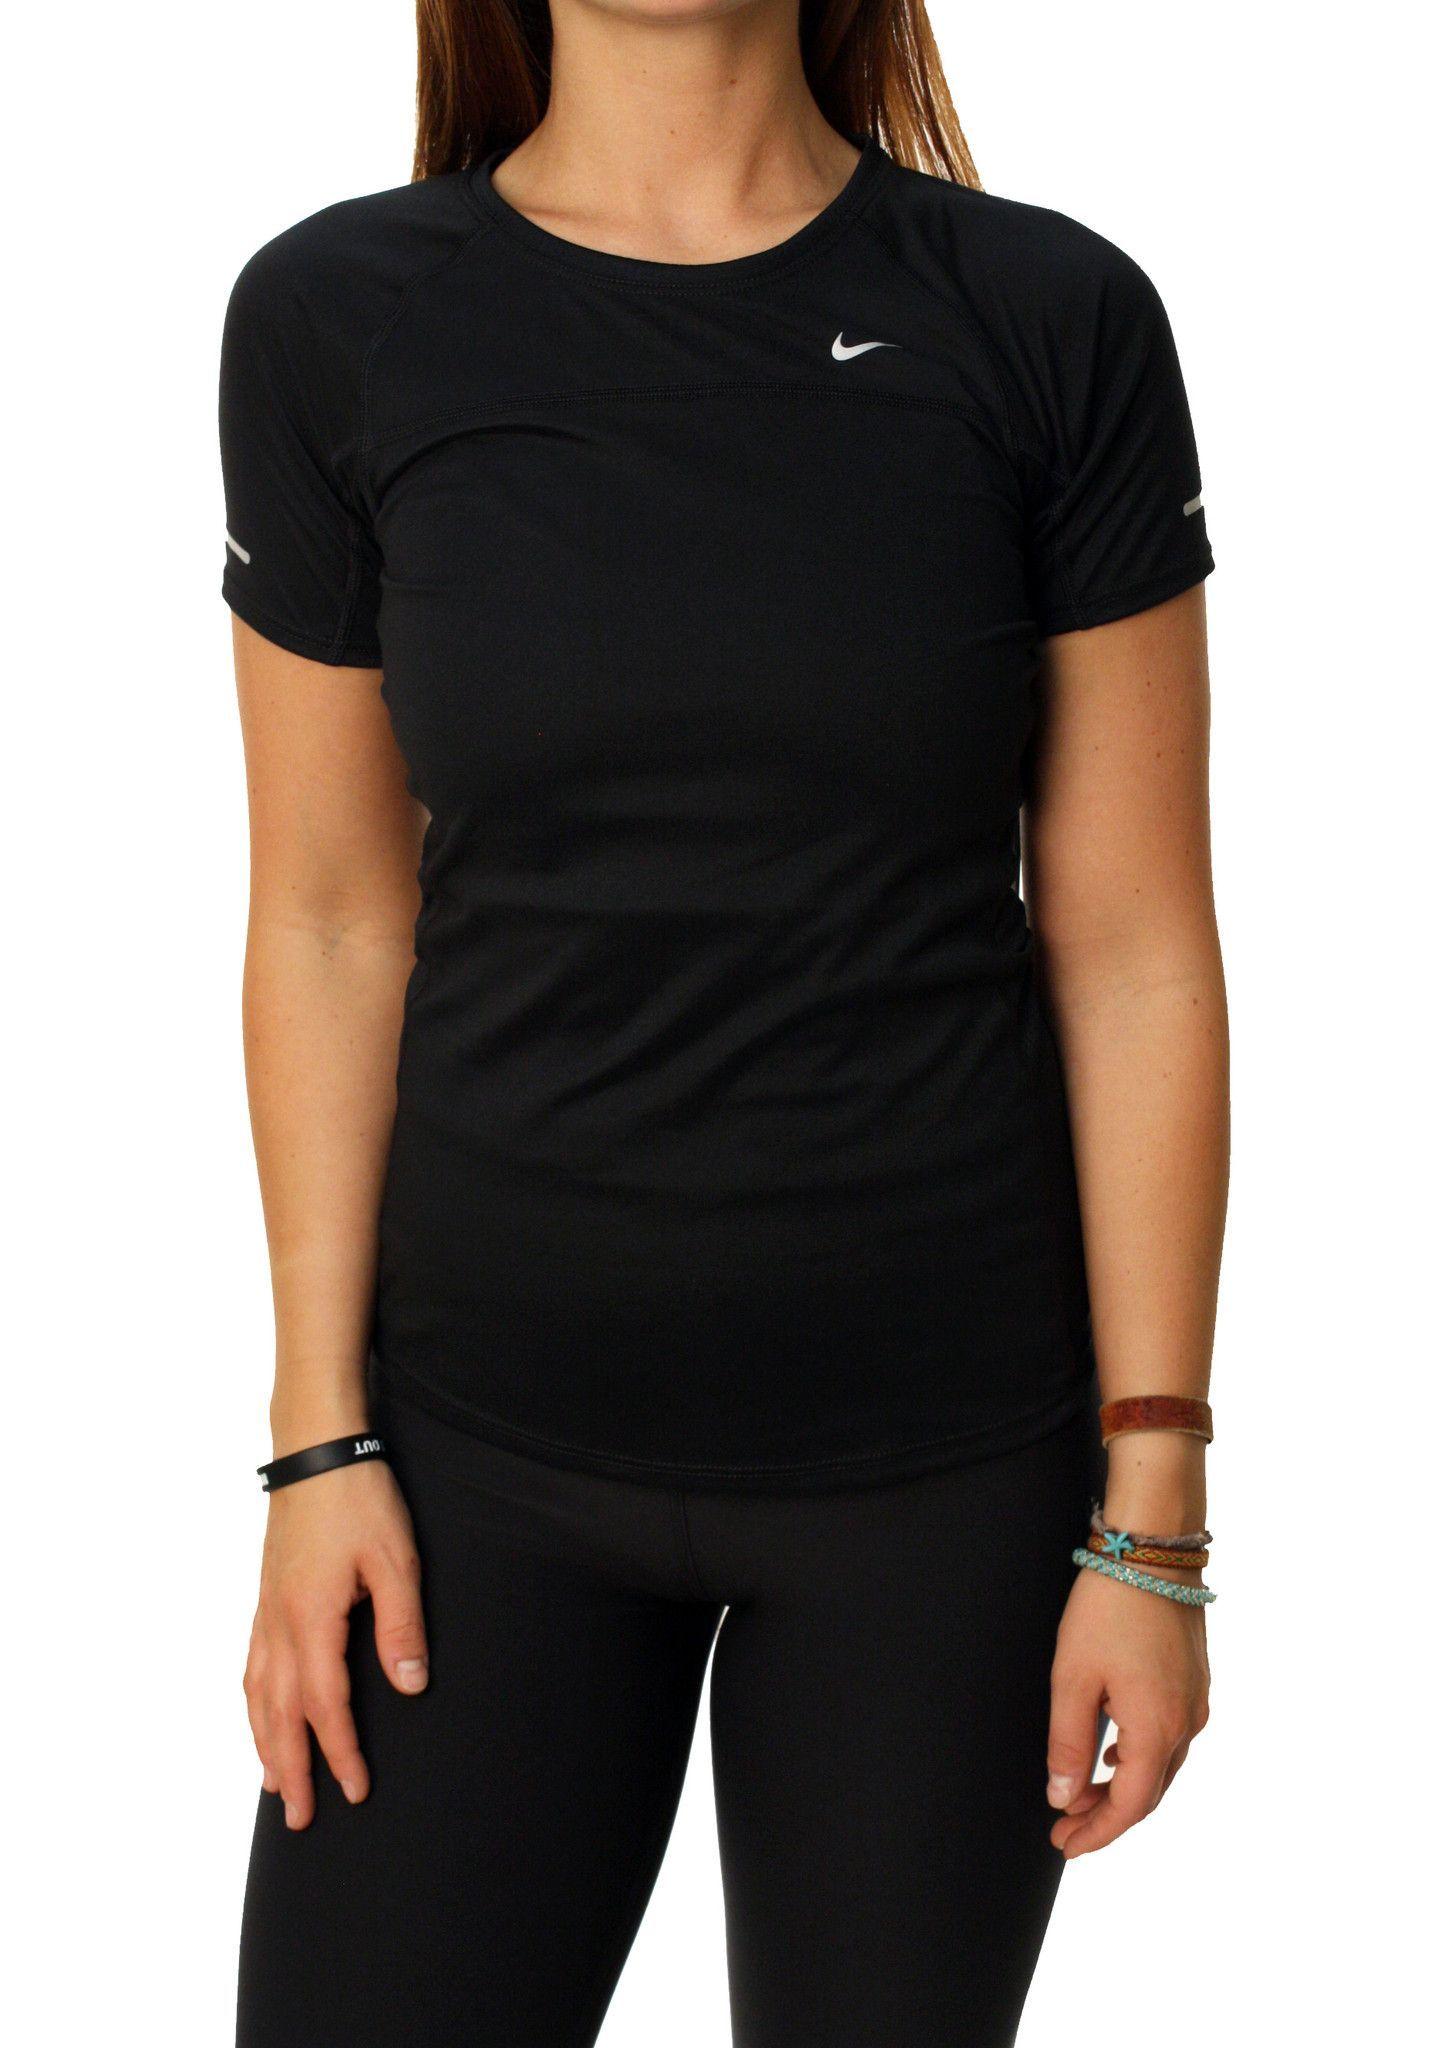 5da02406c9c0 Nike Women s Dri-Fit Stay Cool Miler Running Shirt